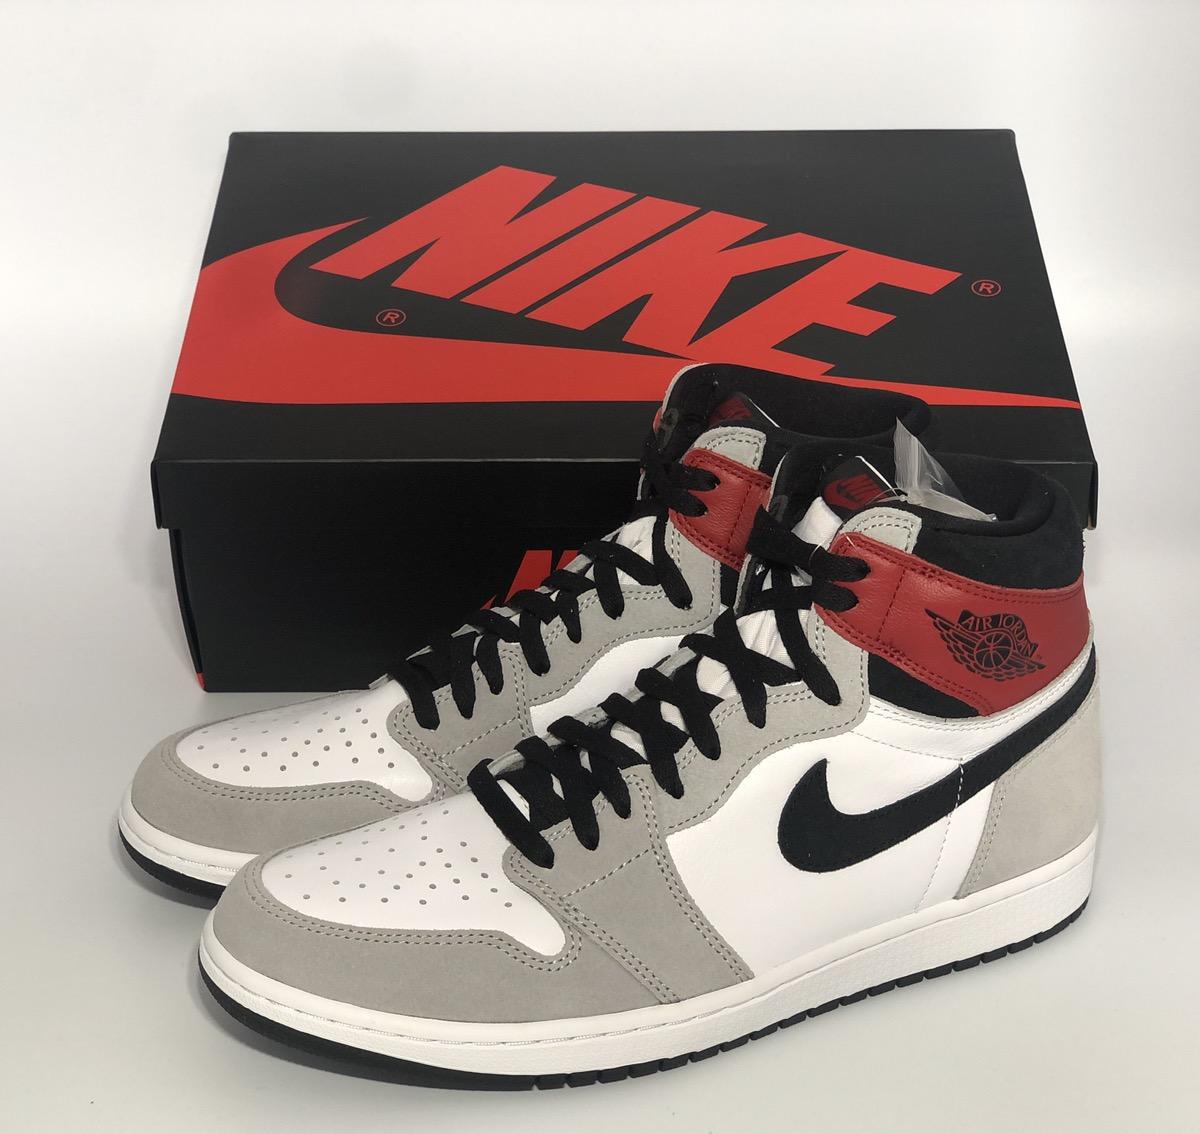 Nike Air Jordan 1 Retro High Og Light Smoke Grey Grailed